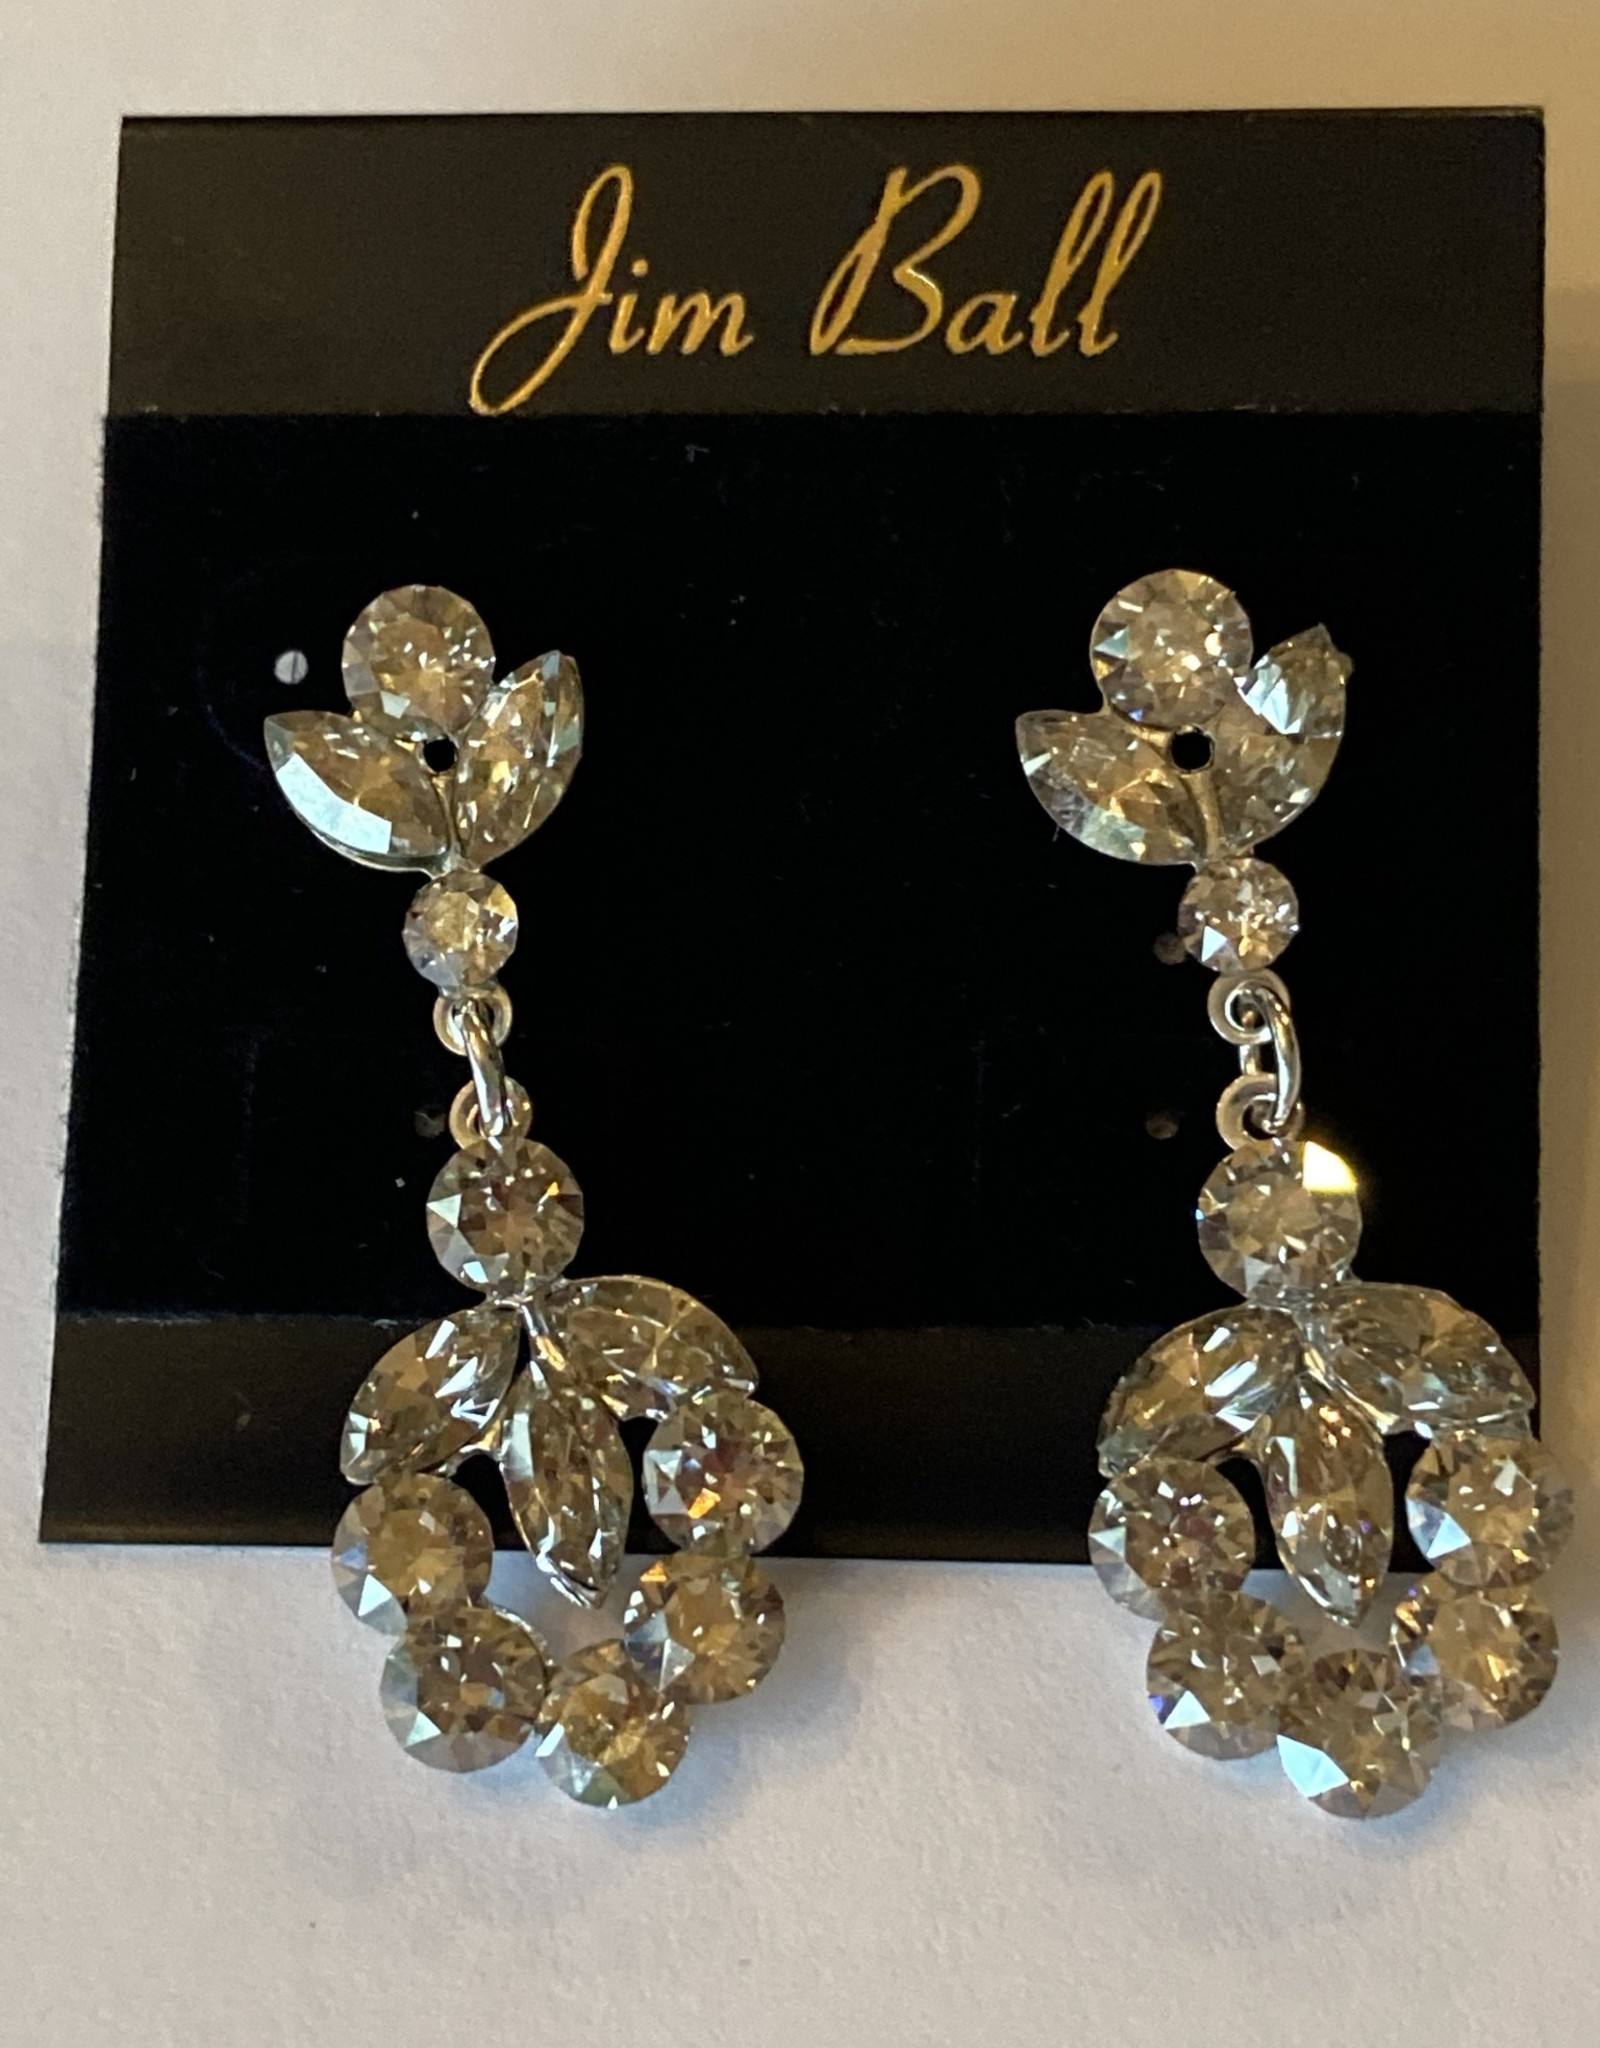 Jim Ball JIM BALL CE19616099 Champagne silver